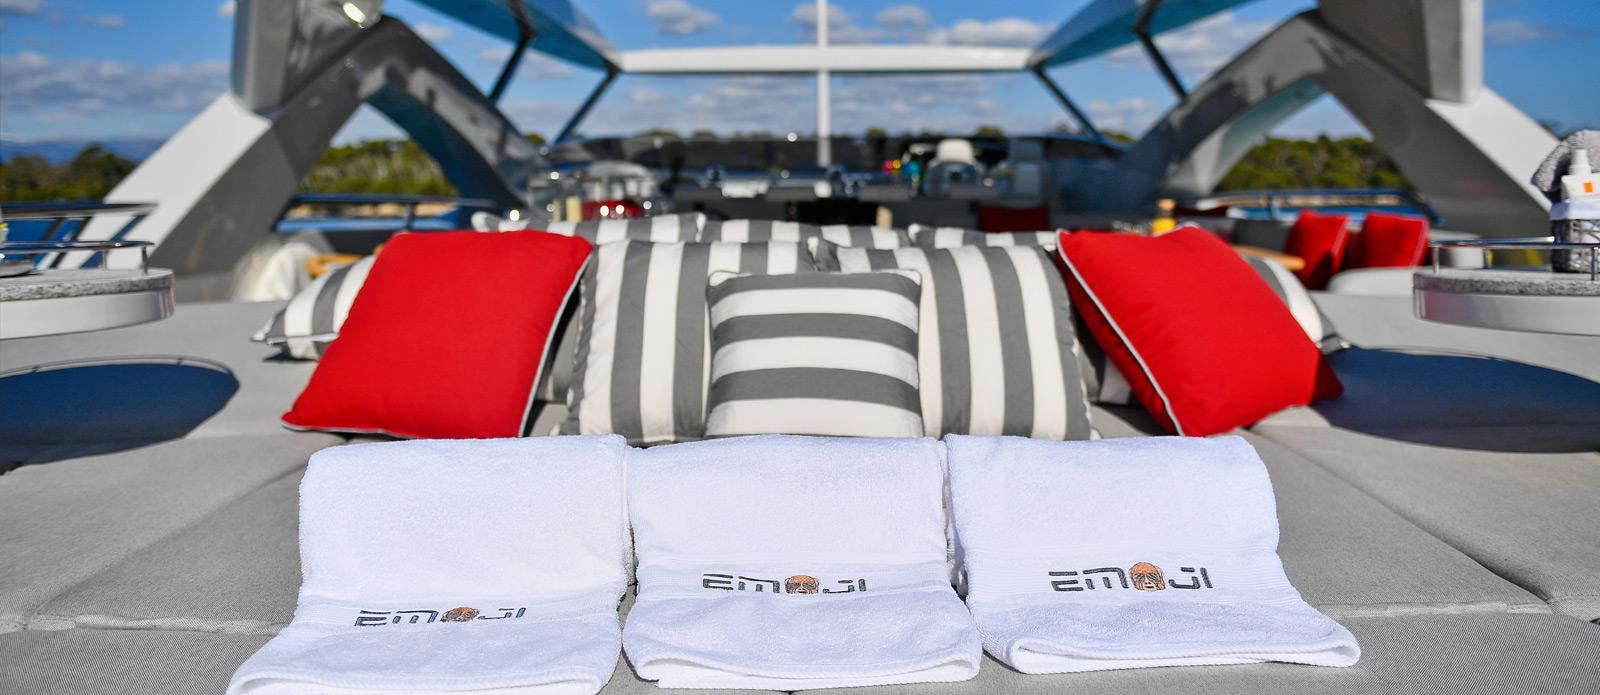 Sunseeker-34-Metre-Yacht---Emoji---Sunpad-2